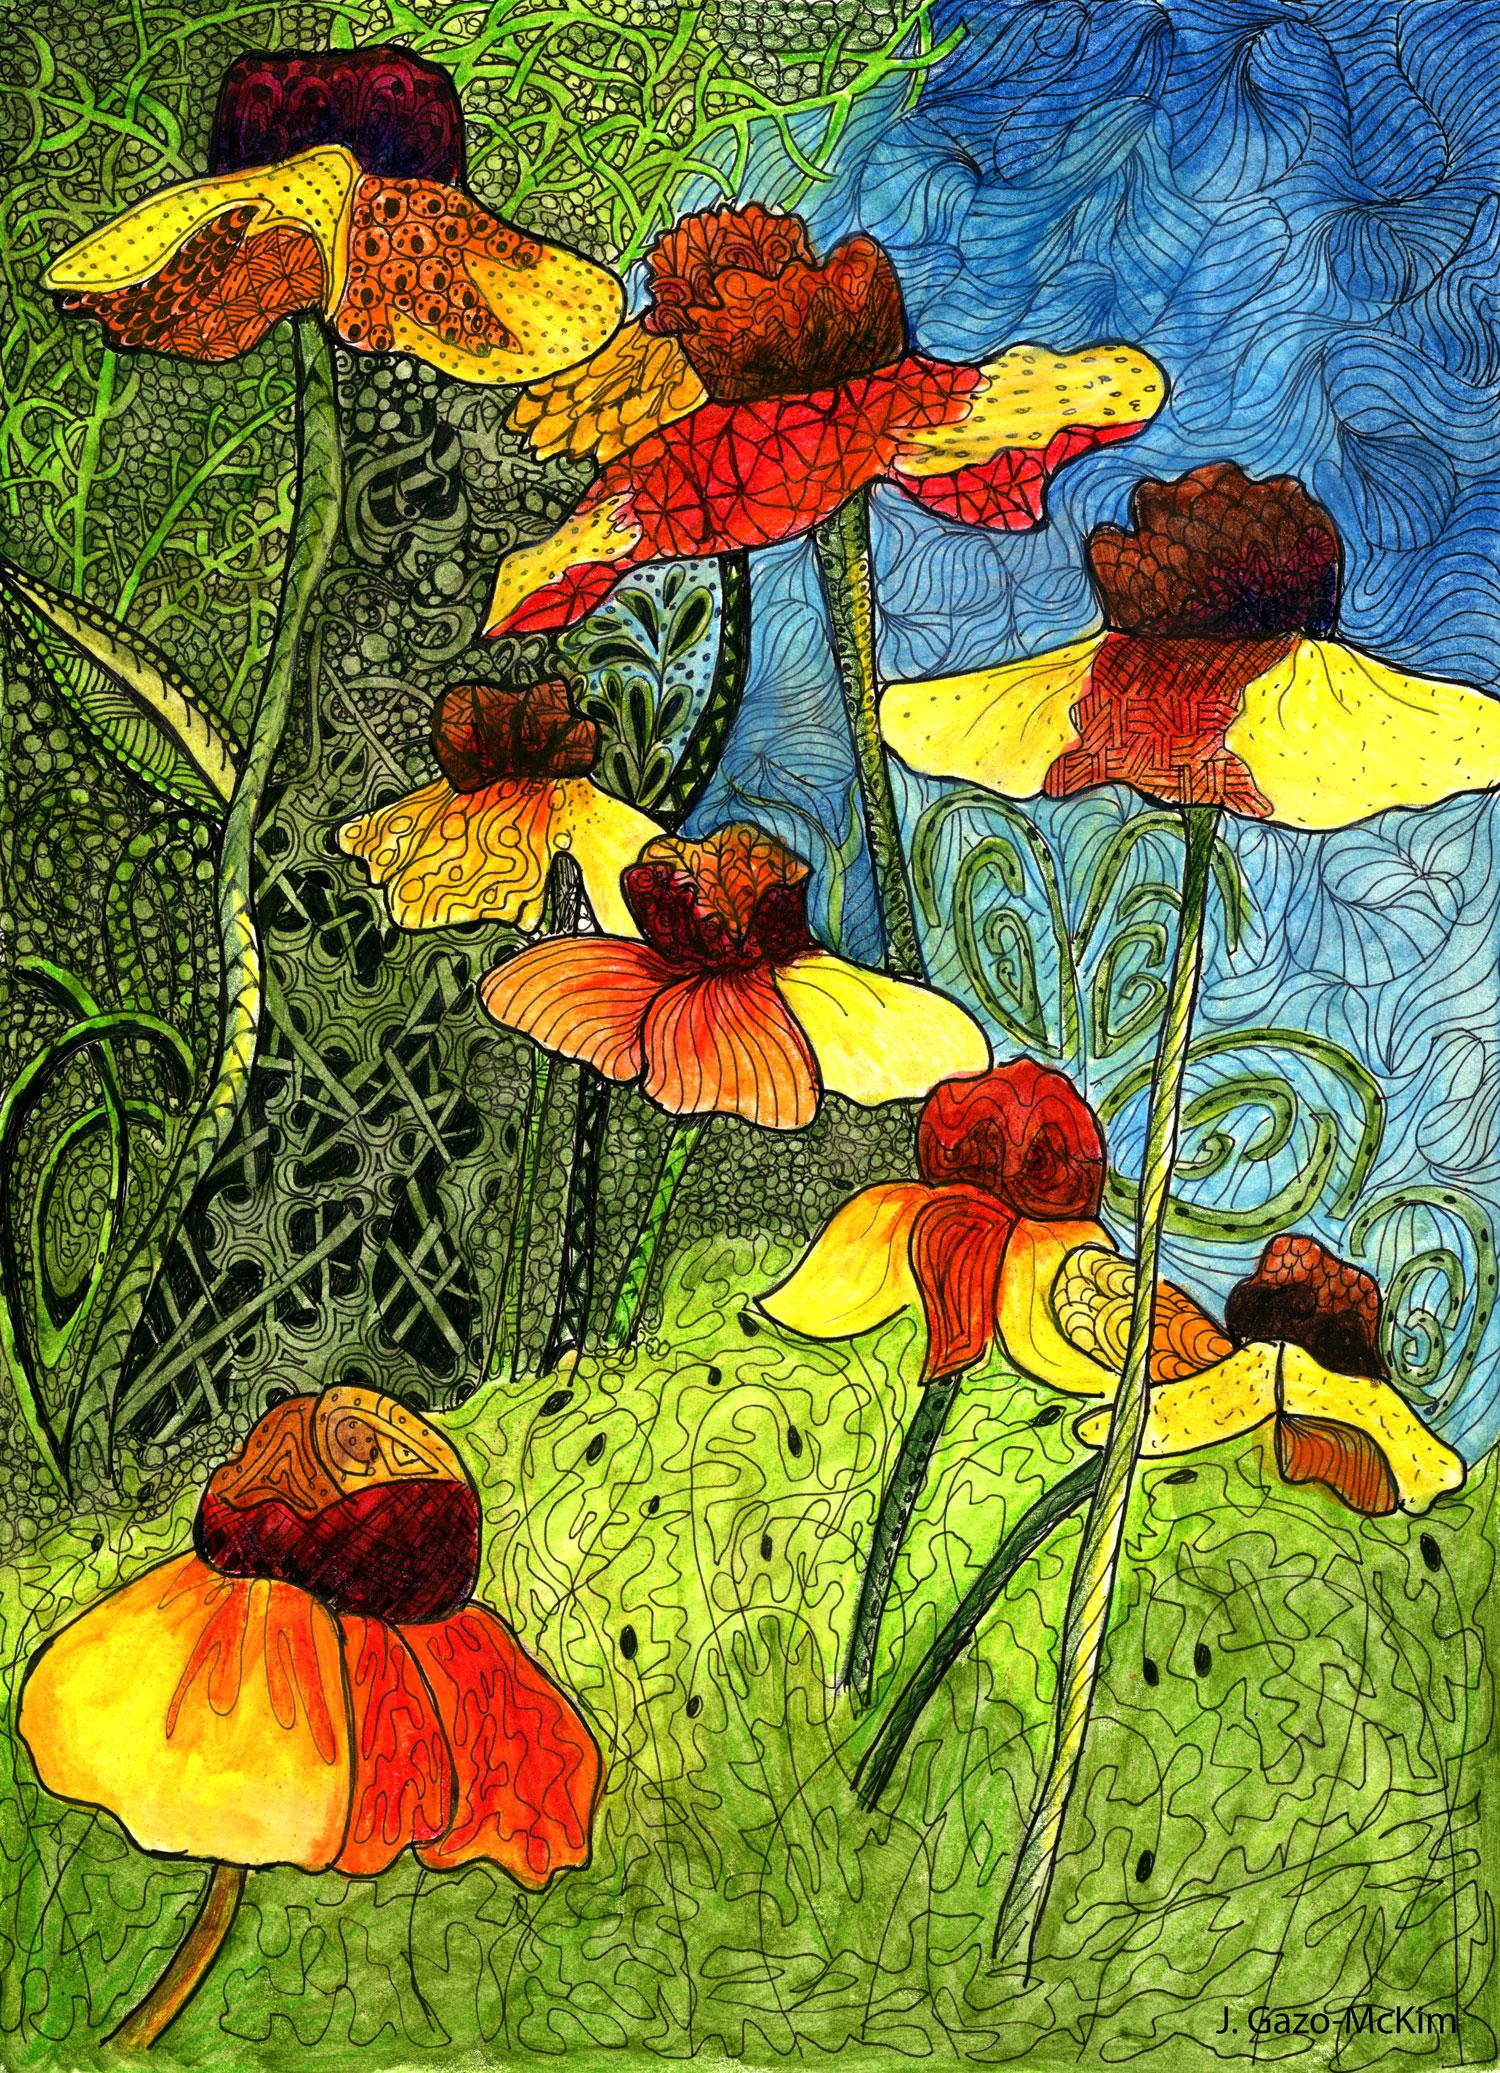 Entangled Garden Pen and Ink by J. Gazo-McKim ©2014